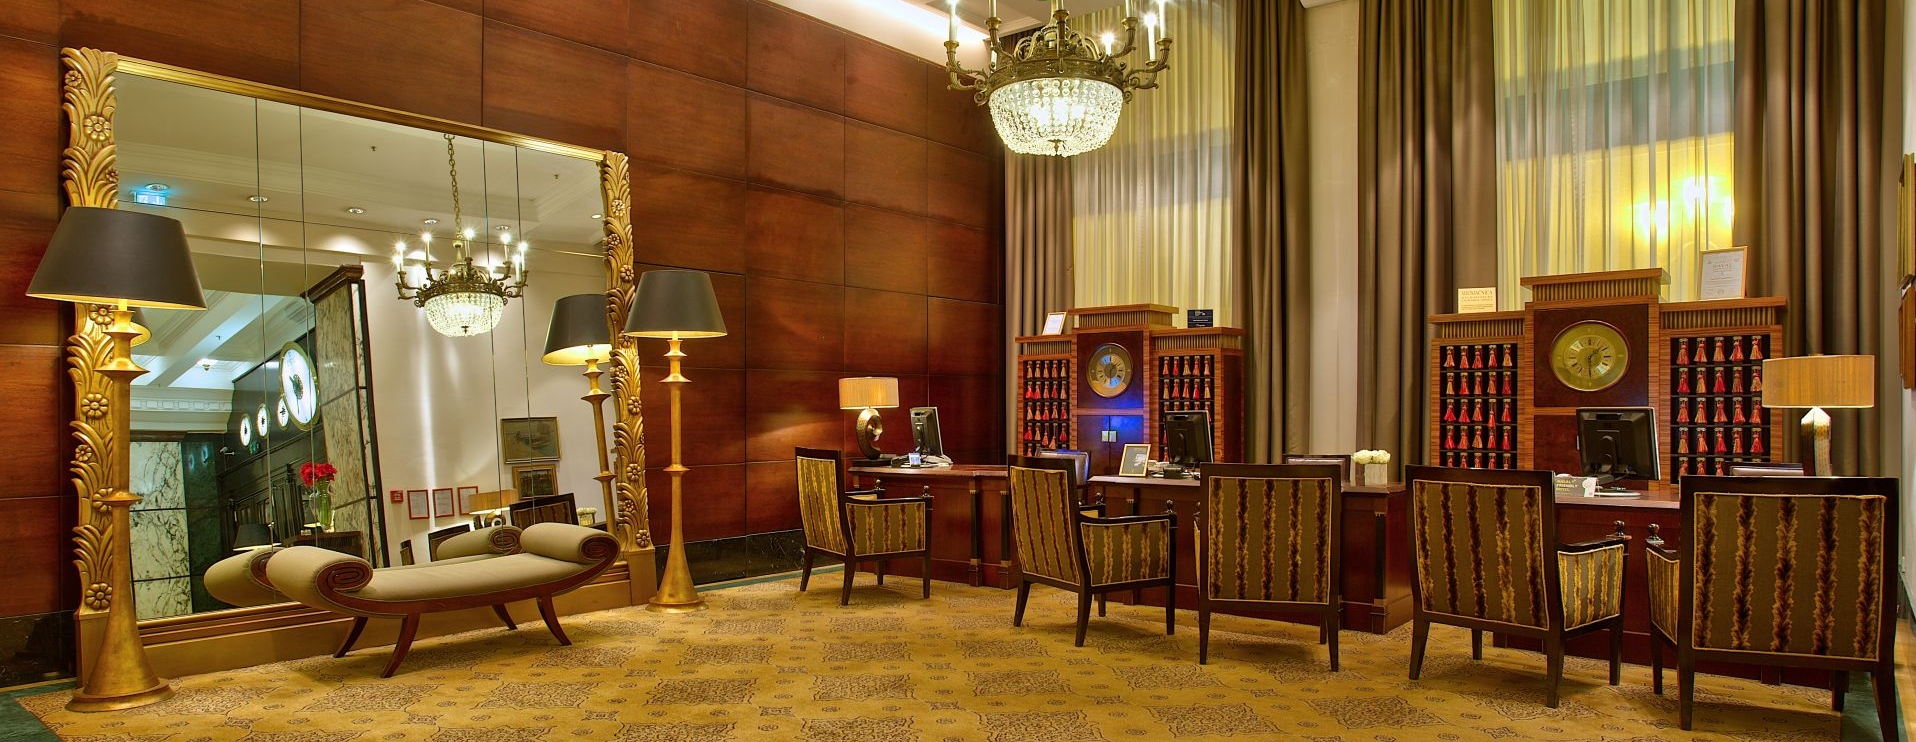 Hotel Esplanade i L'Occitane predstavljaju ekskluzivnu kolekciju Spa Ritual kupki